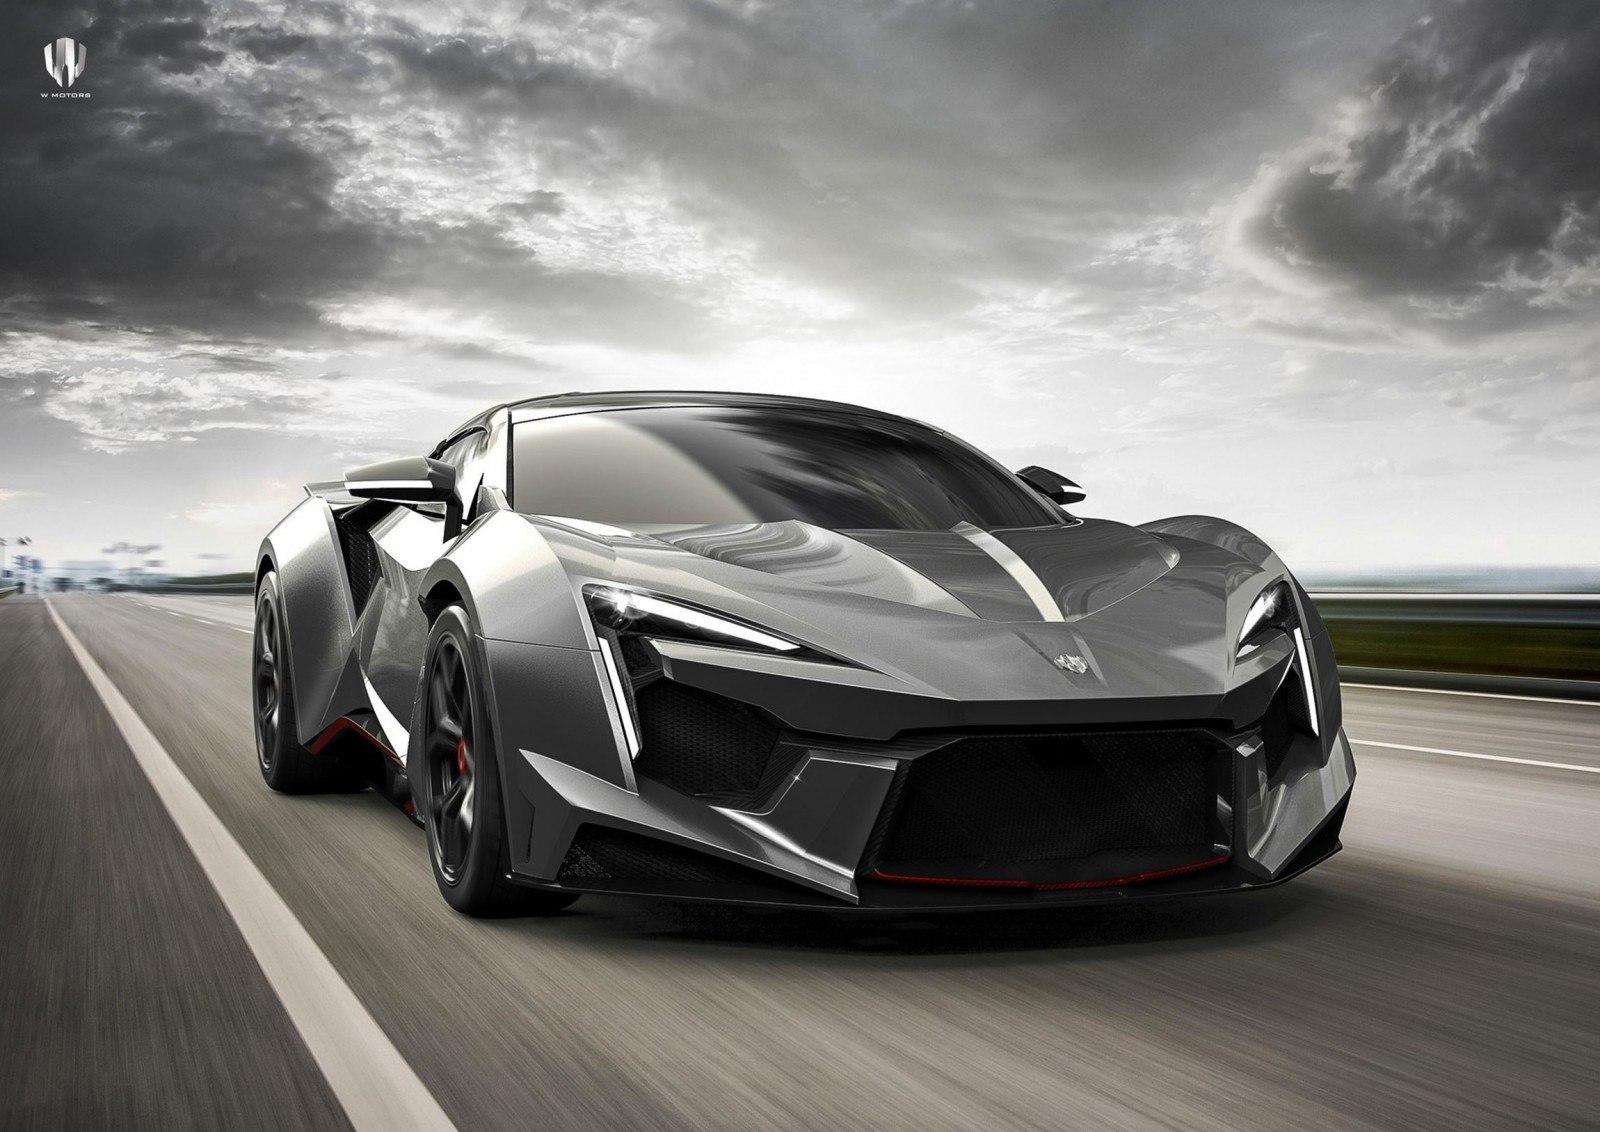 W Motors Fenyr >> 2016 W Motors FENYR SuperSport